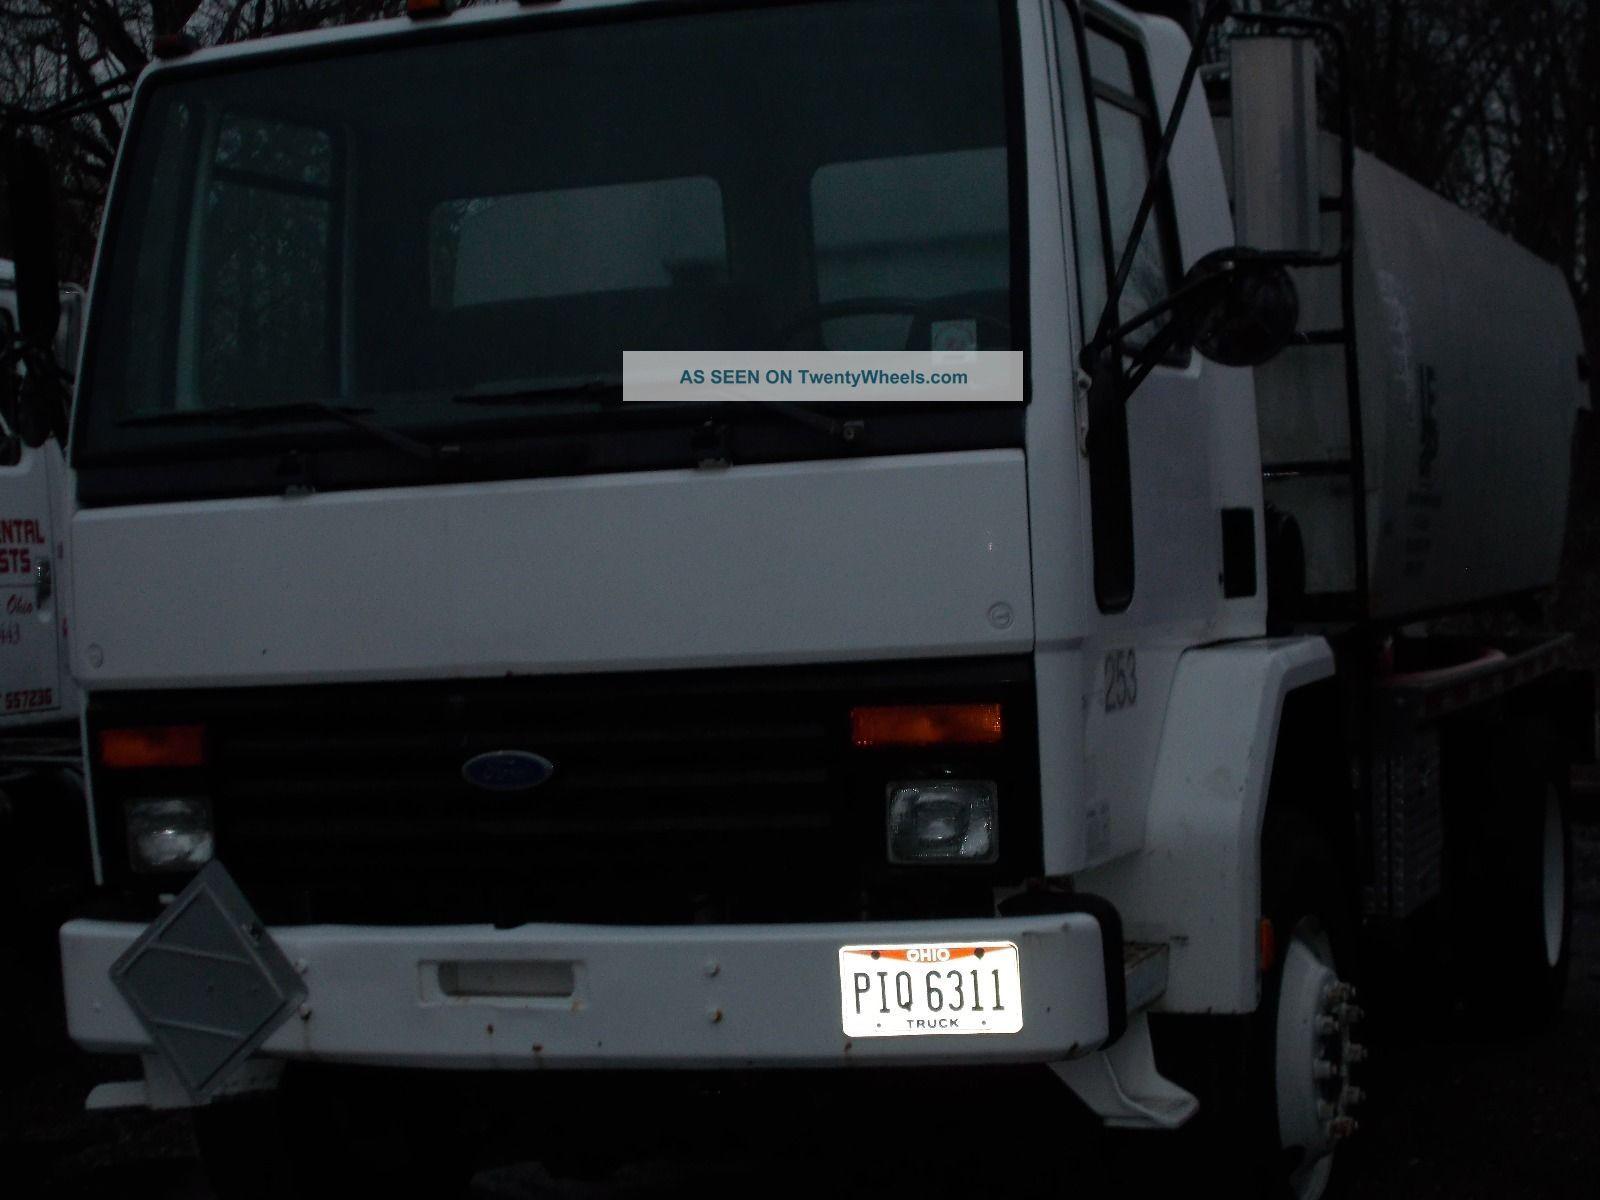 1994 Ford Cf 7000 Other Heavy Duty Trucks photo